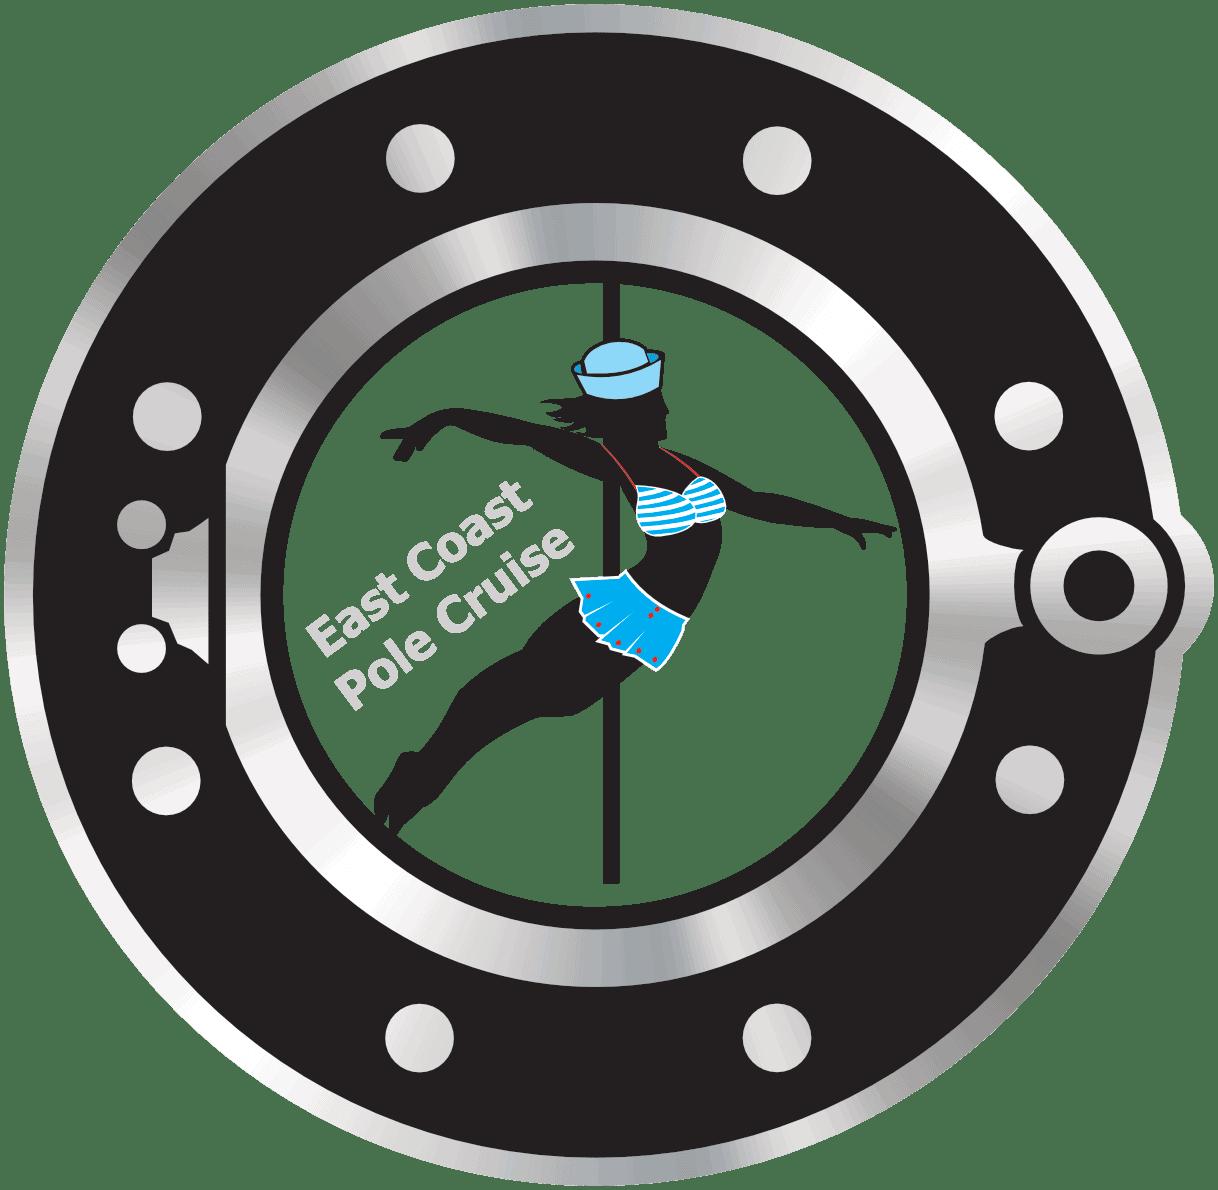 Pole-Cruise-logo-transparent.png